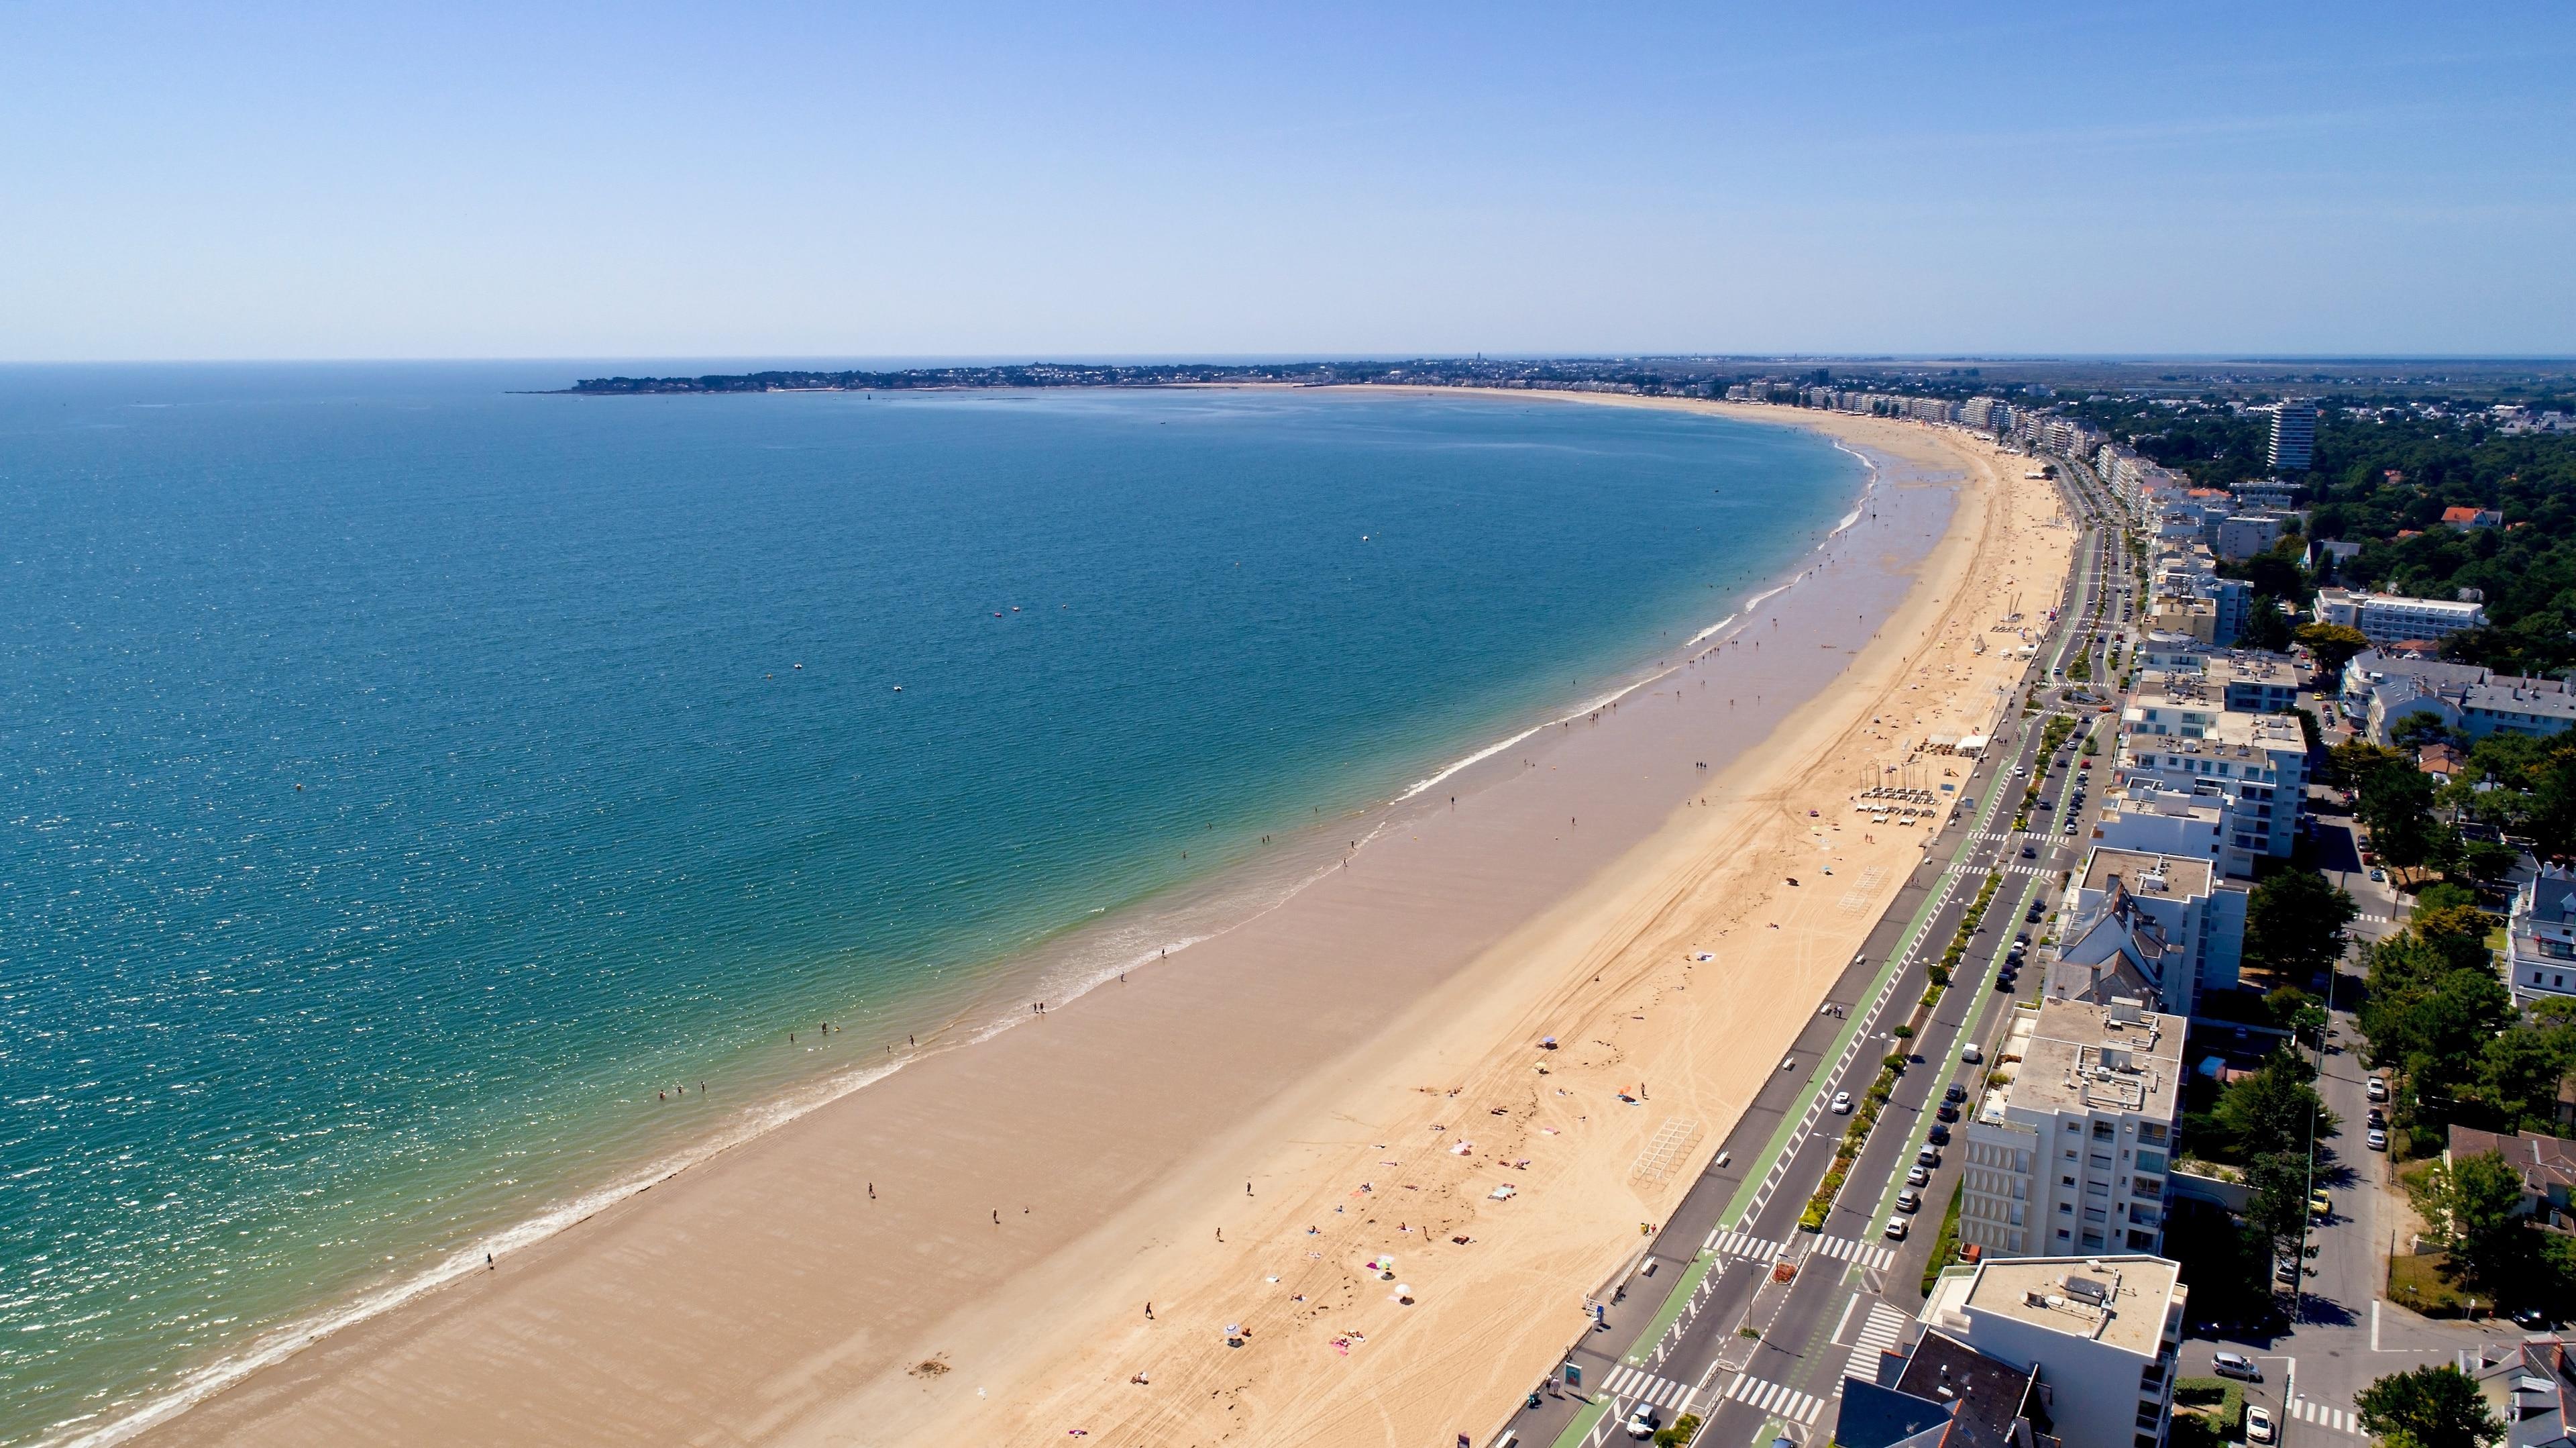 La Baule Beach, La Baule-Escoublac, Loire-Atlantique, France